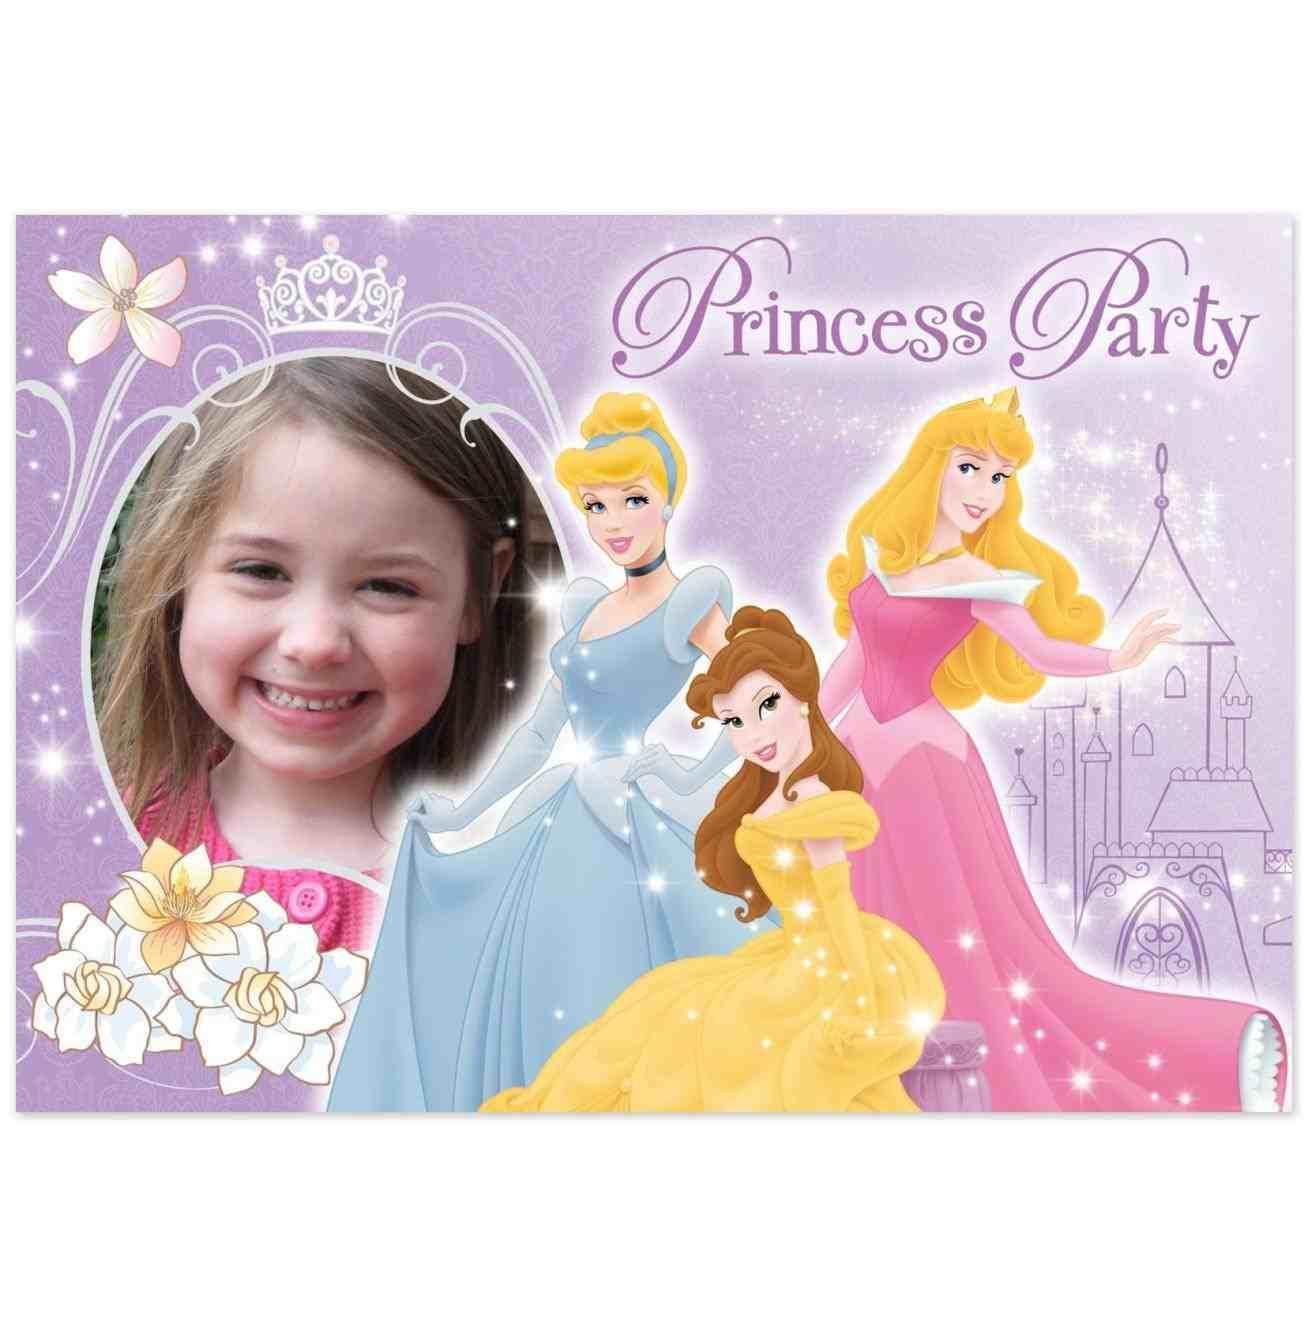 Disney Princess Invitations Templates